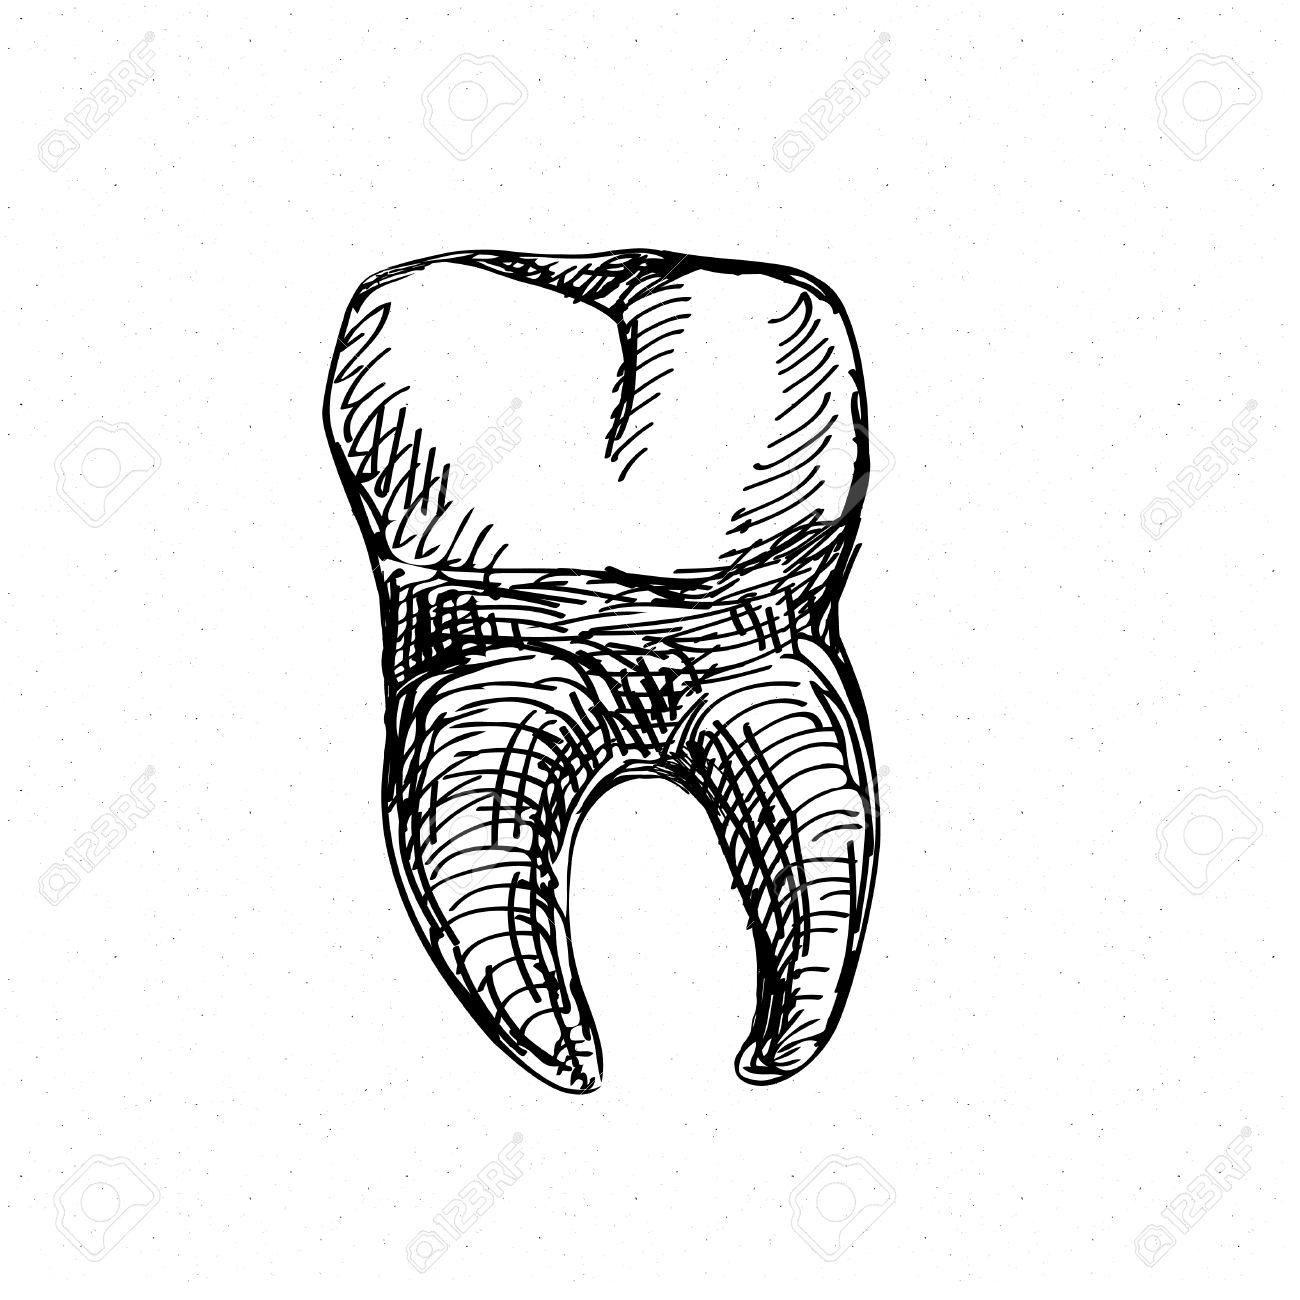 Tooth Drawing At Getdrawings